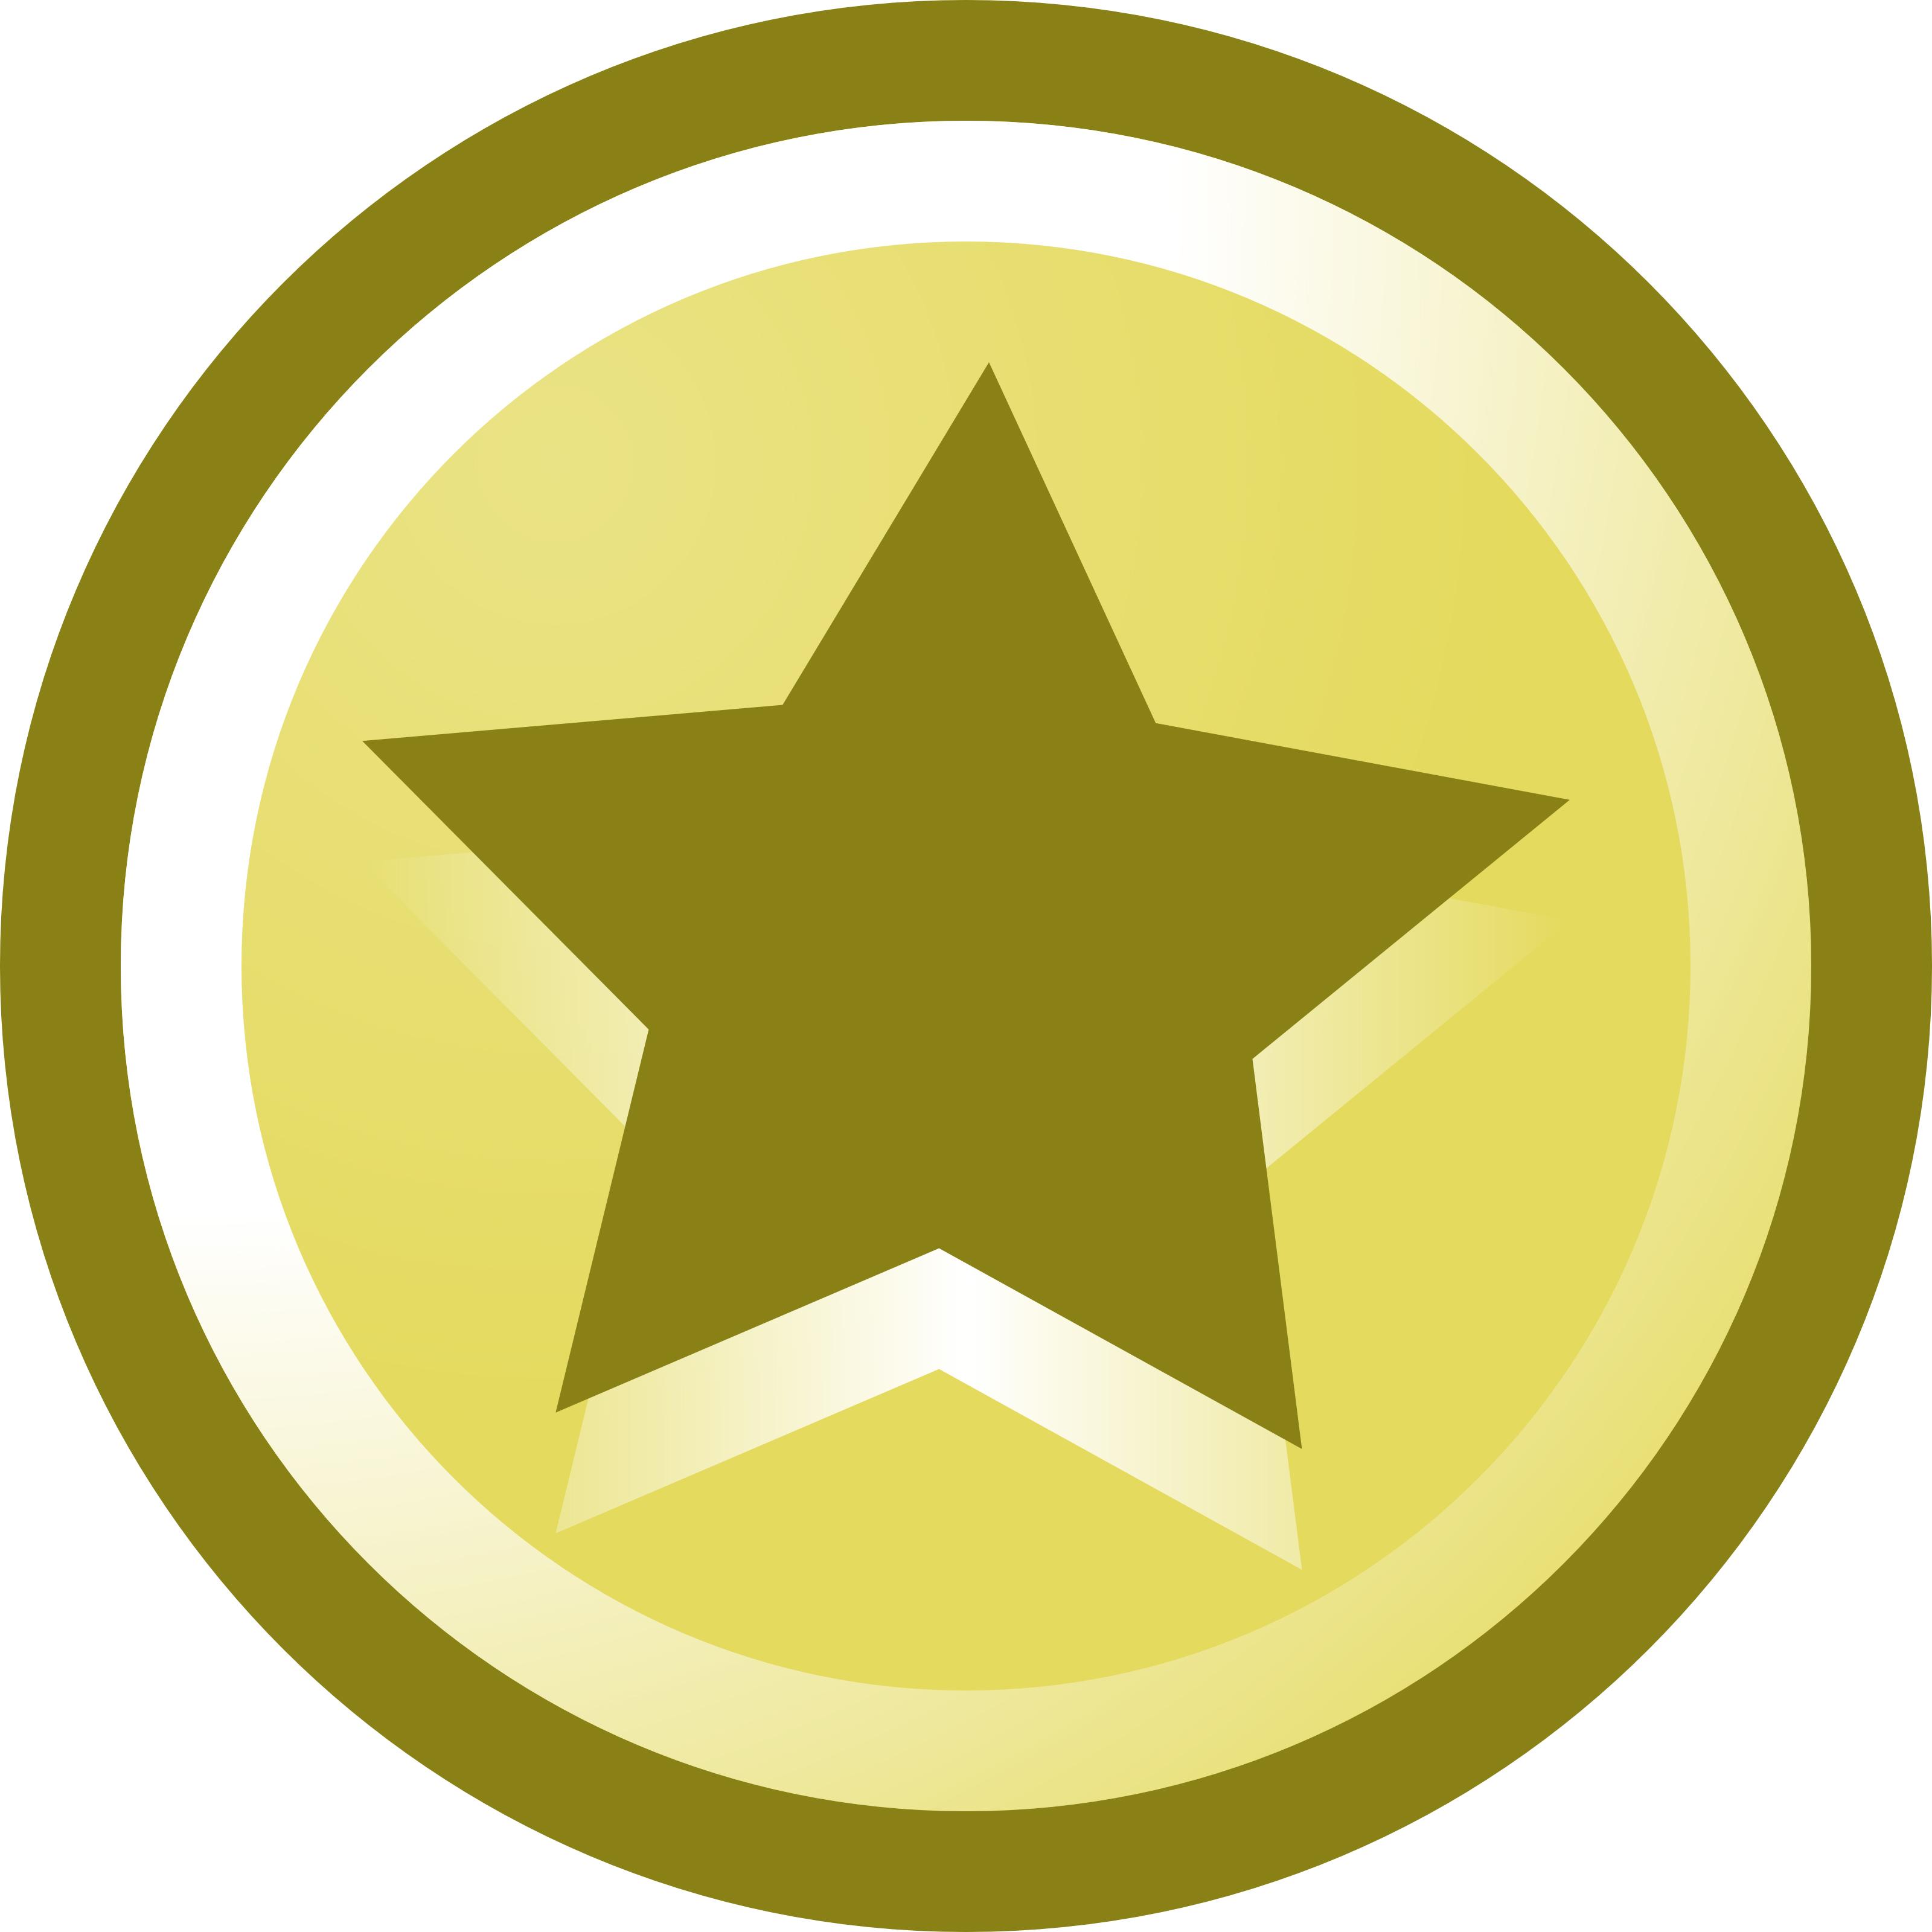 3200x3200 Five Star Circle Clipart